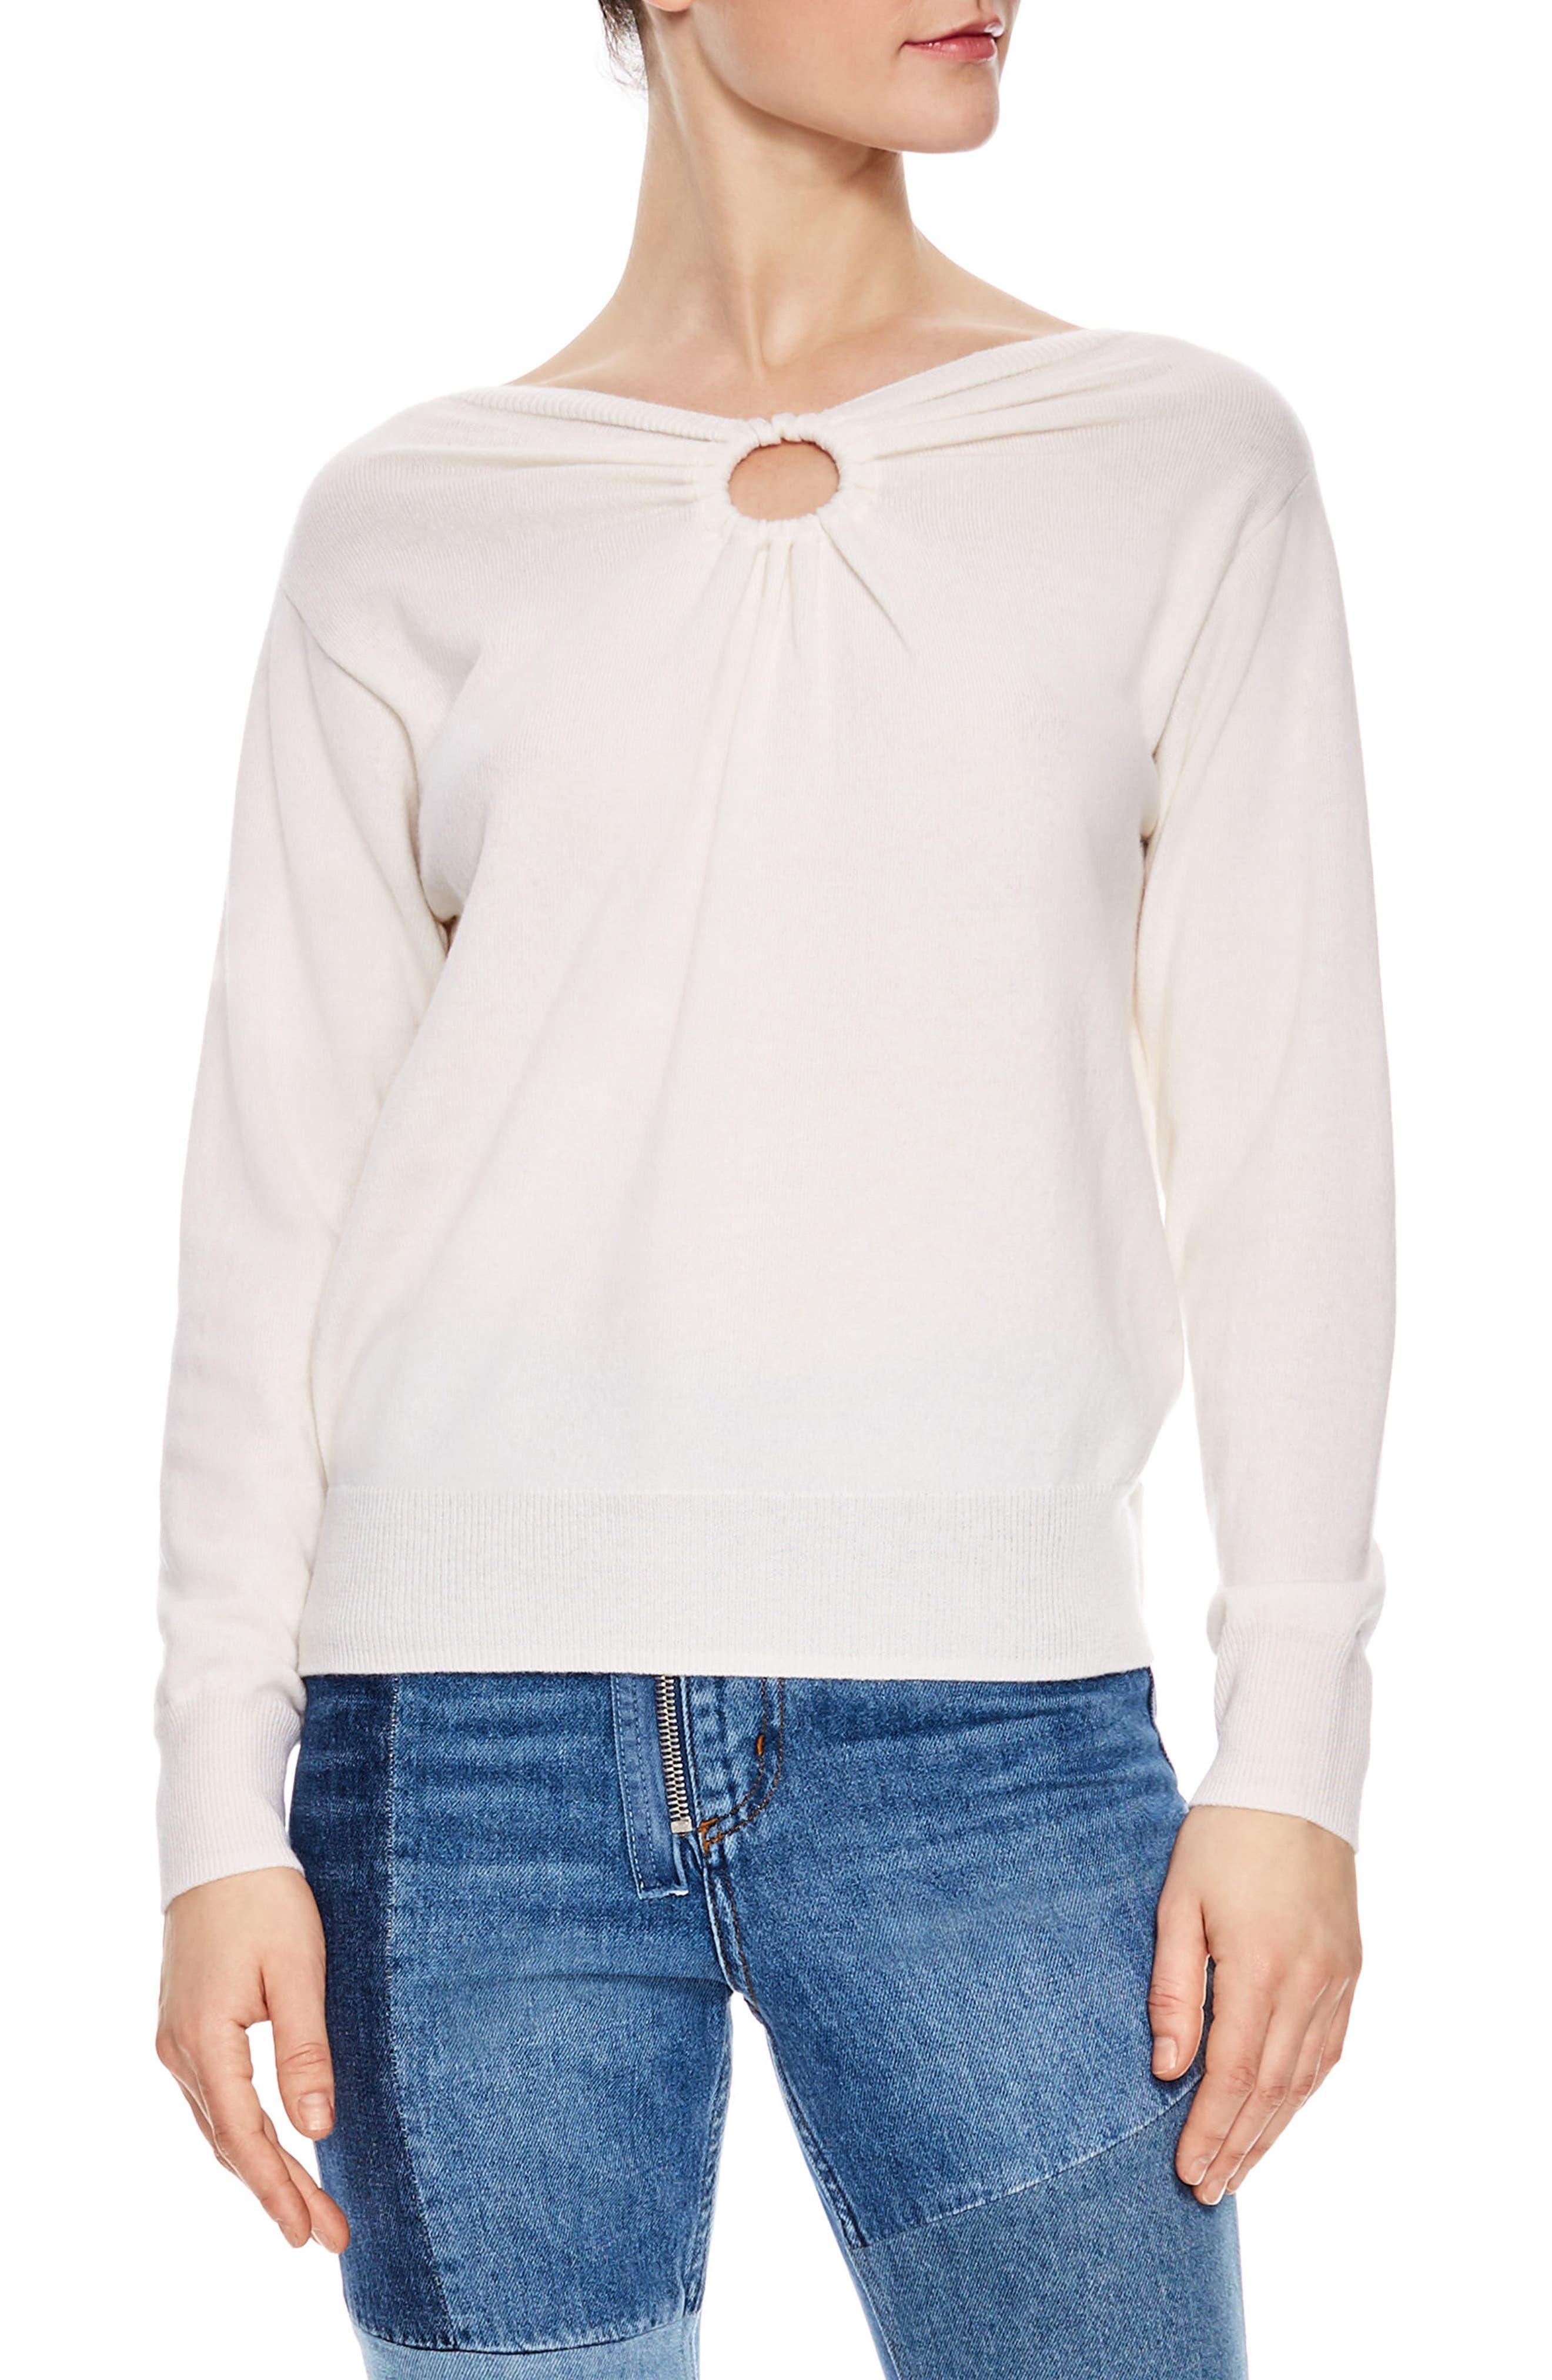 Keyhole Wool & Cashmere Sweater,                             Main thumbnail 1, color,                             Ecru